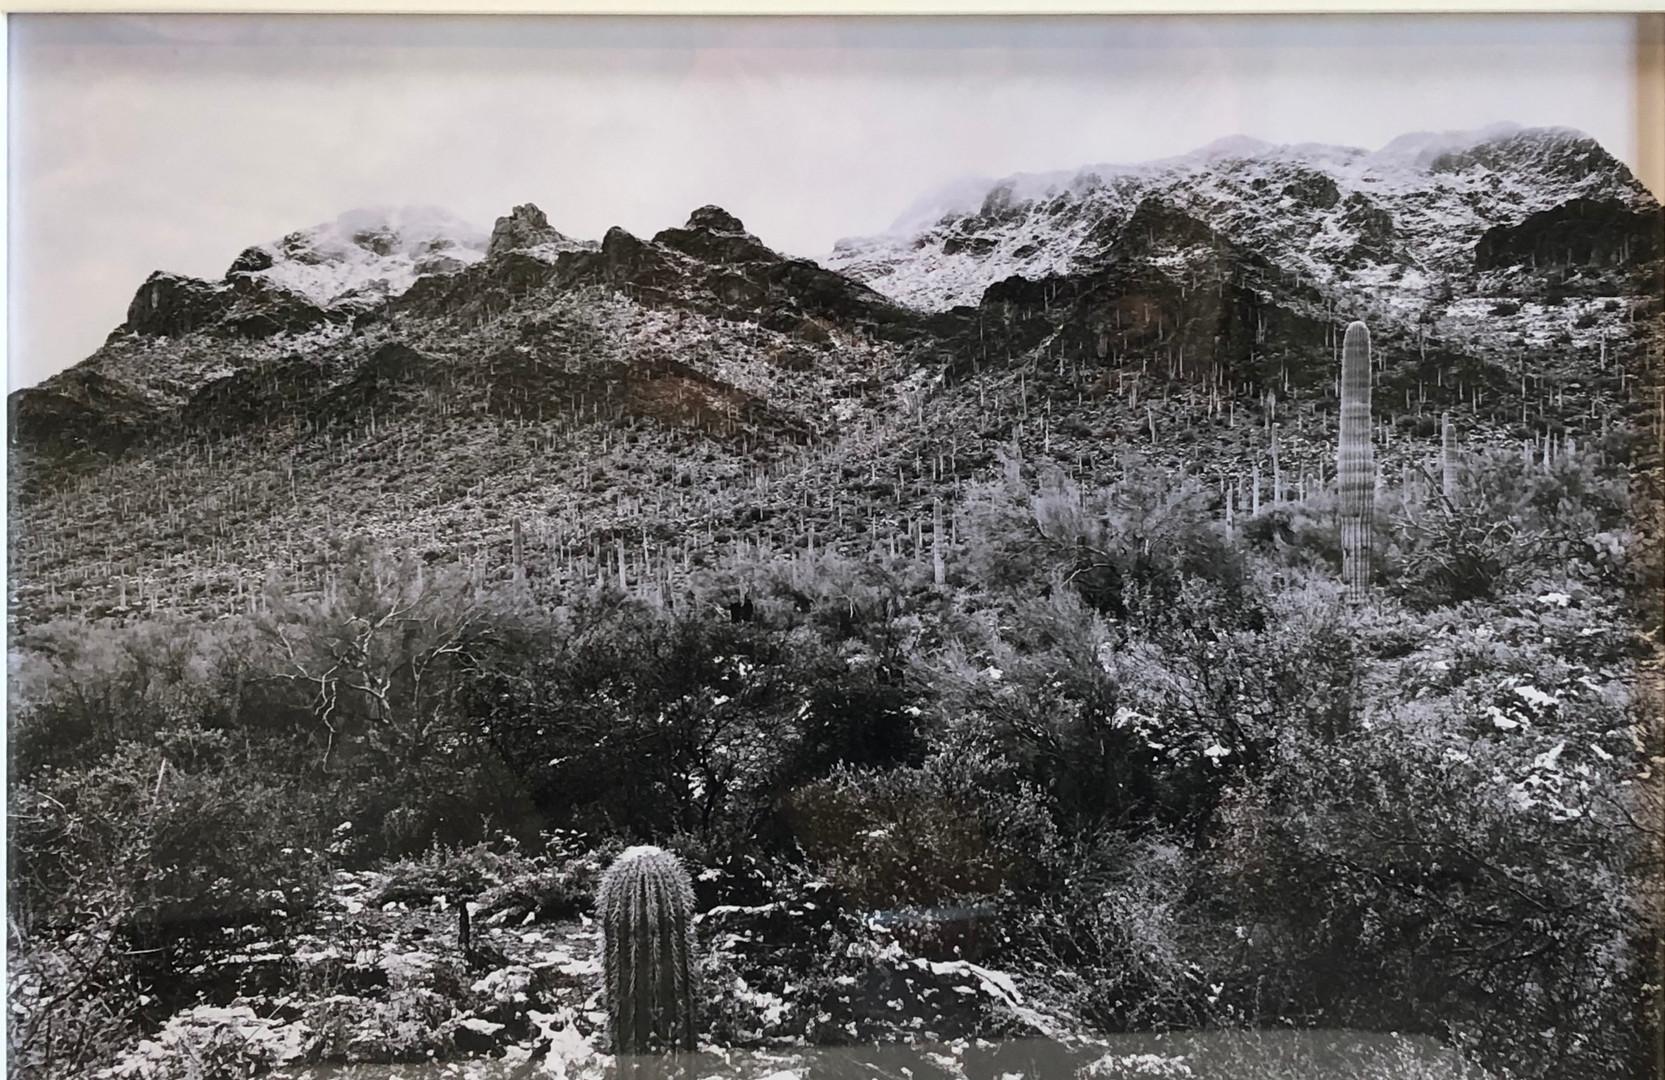 """Sonoran Snow"" by Jim McWilliams"